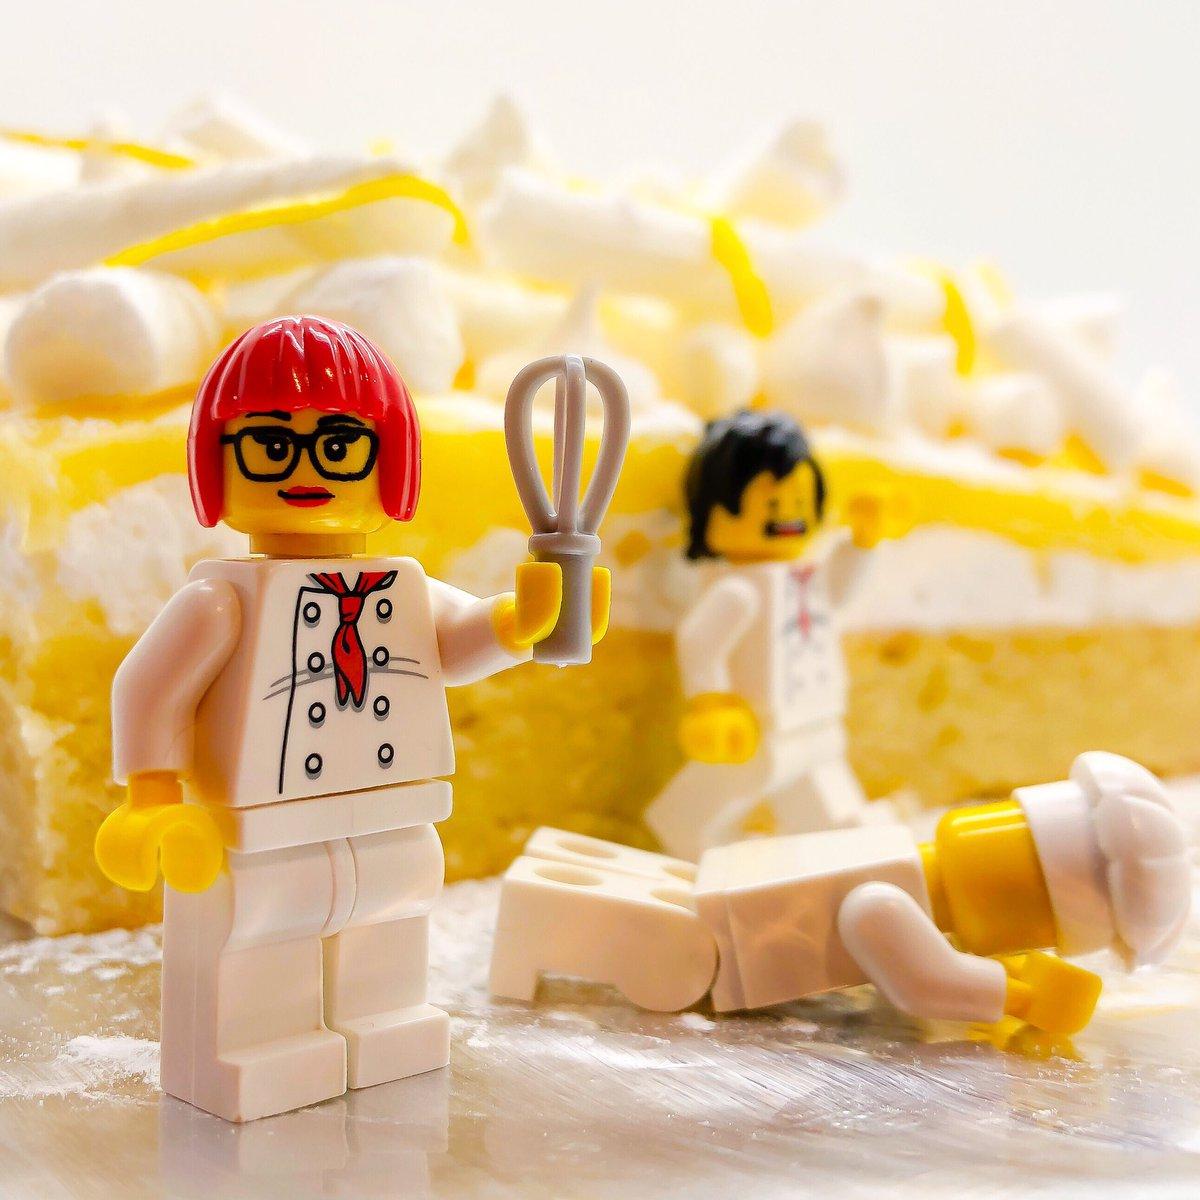 Happy #LemonMeringuePieDay ... my attempt at @Claire_Clark's #lemonmeringue.... a taste sensation... however still getting  the lemon curd off the ceiling! #oops https://t.co/S4CF9Ircmw